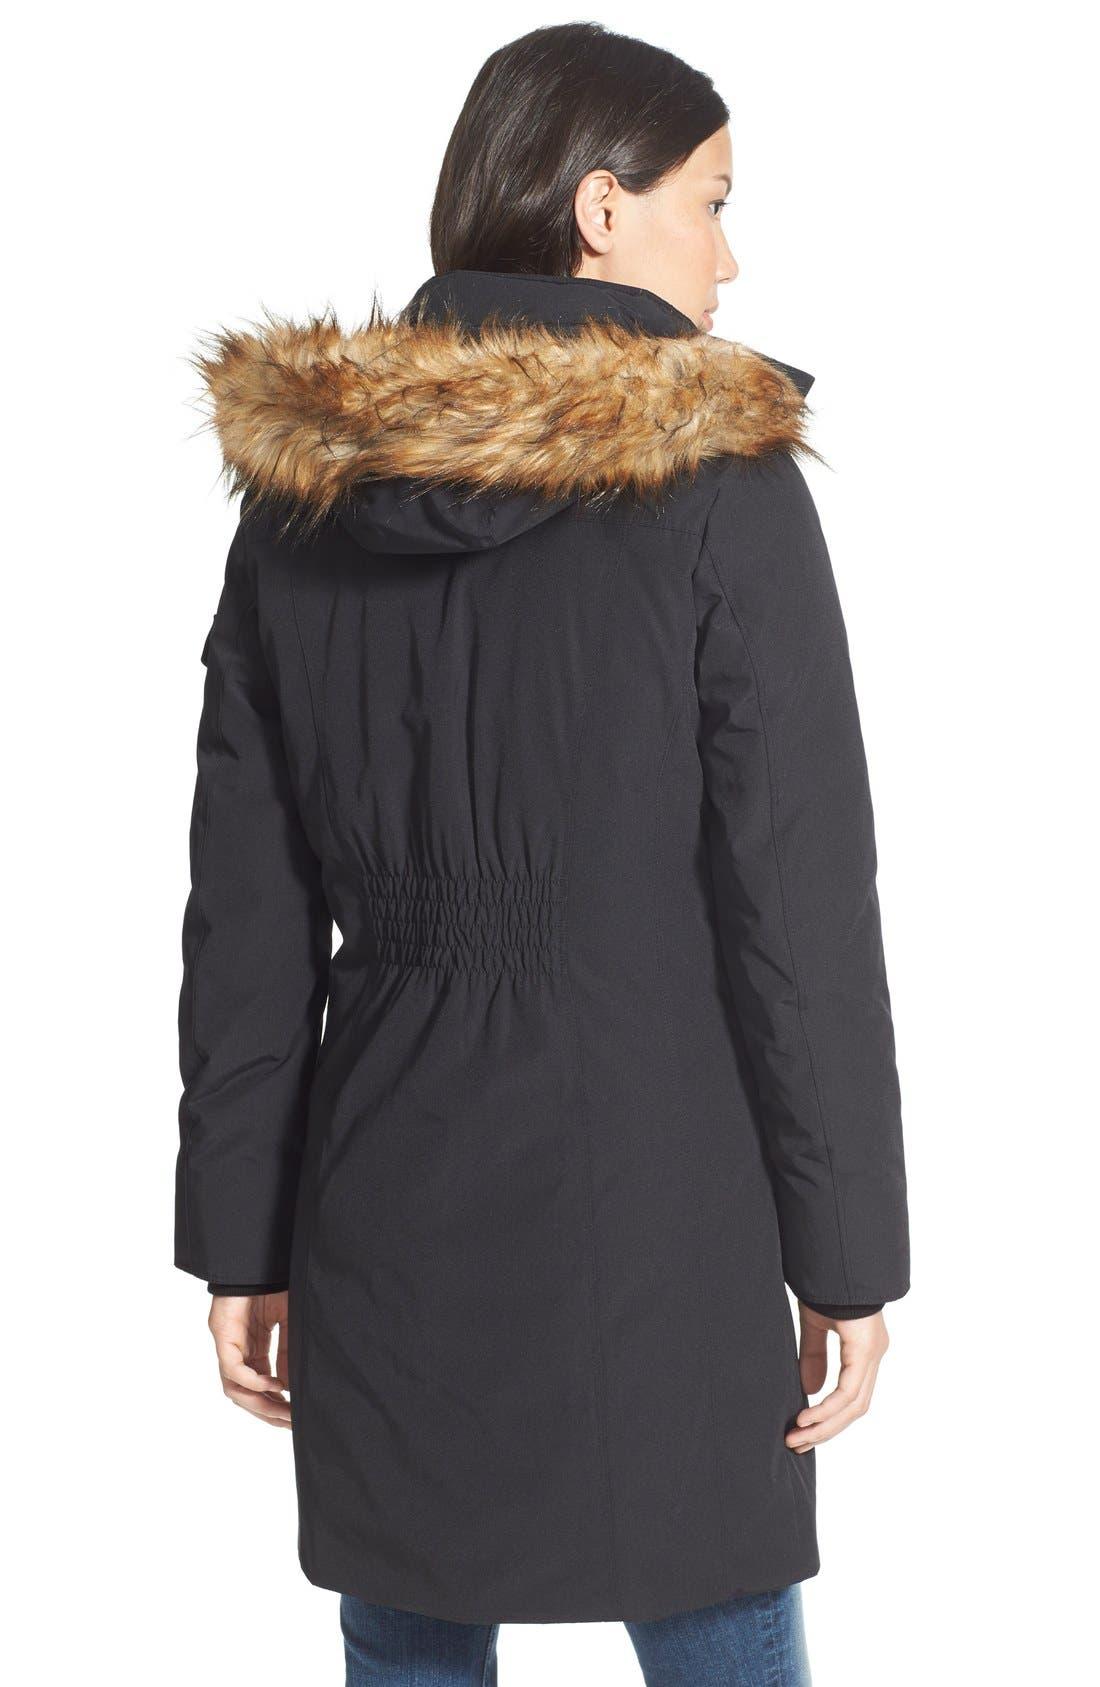 Alternate Image 2  - MICHAEL Michael Kors 'Expedition' Faux Fur Trim Down & Feather Fill Parka